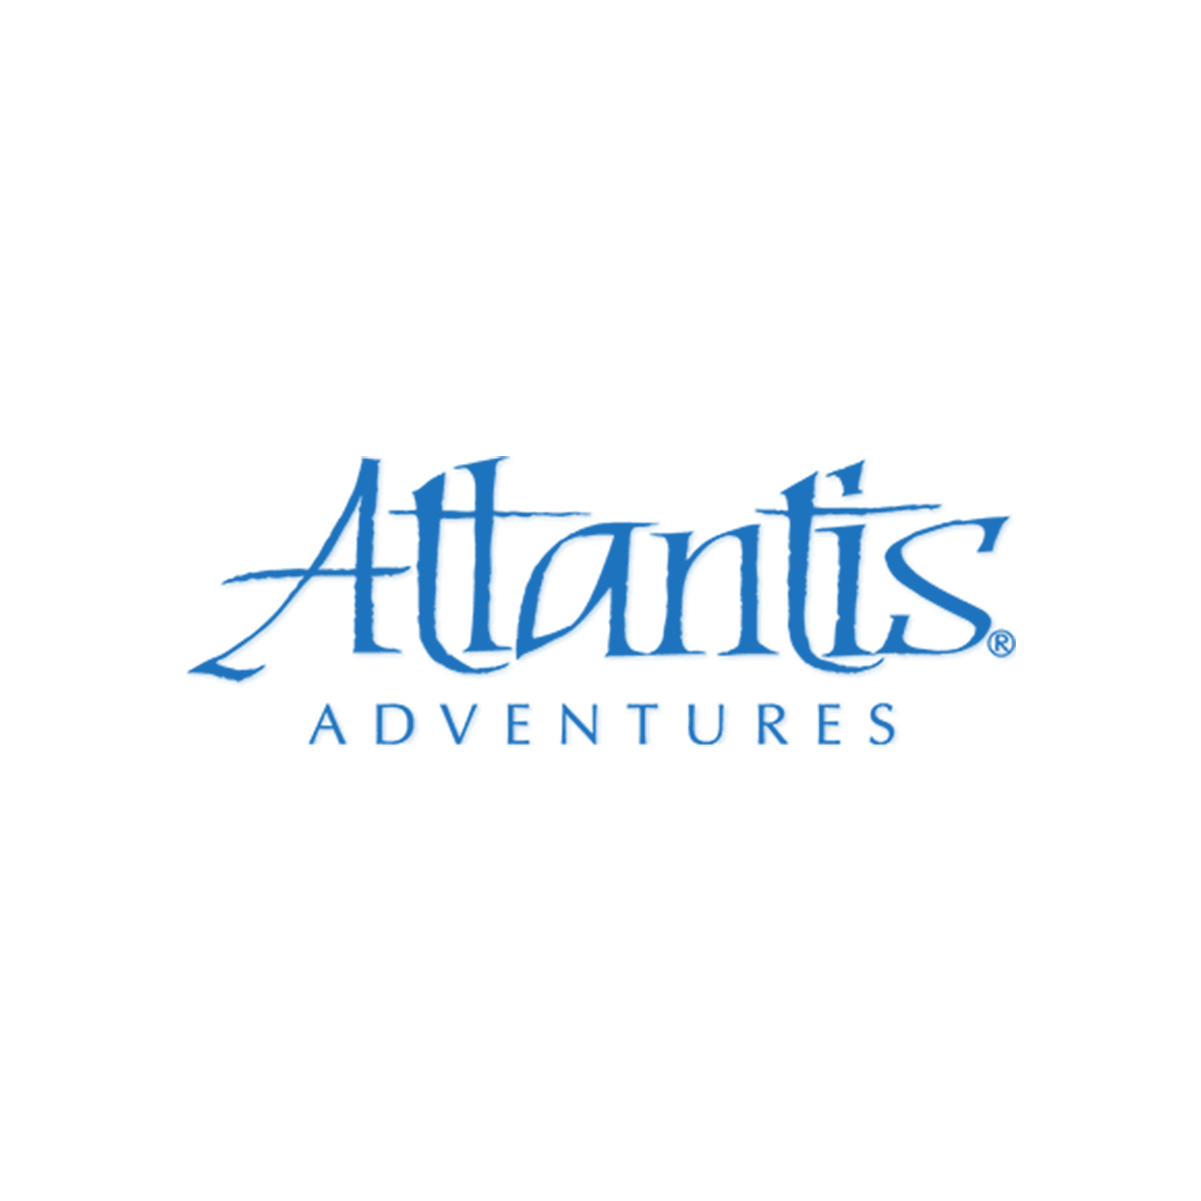 https://www.everydayvoip.eu/wp-content/uploads/sites/5/2020/05/atlantis_logo.jpg